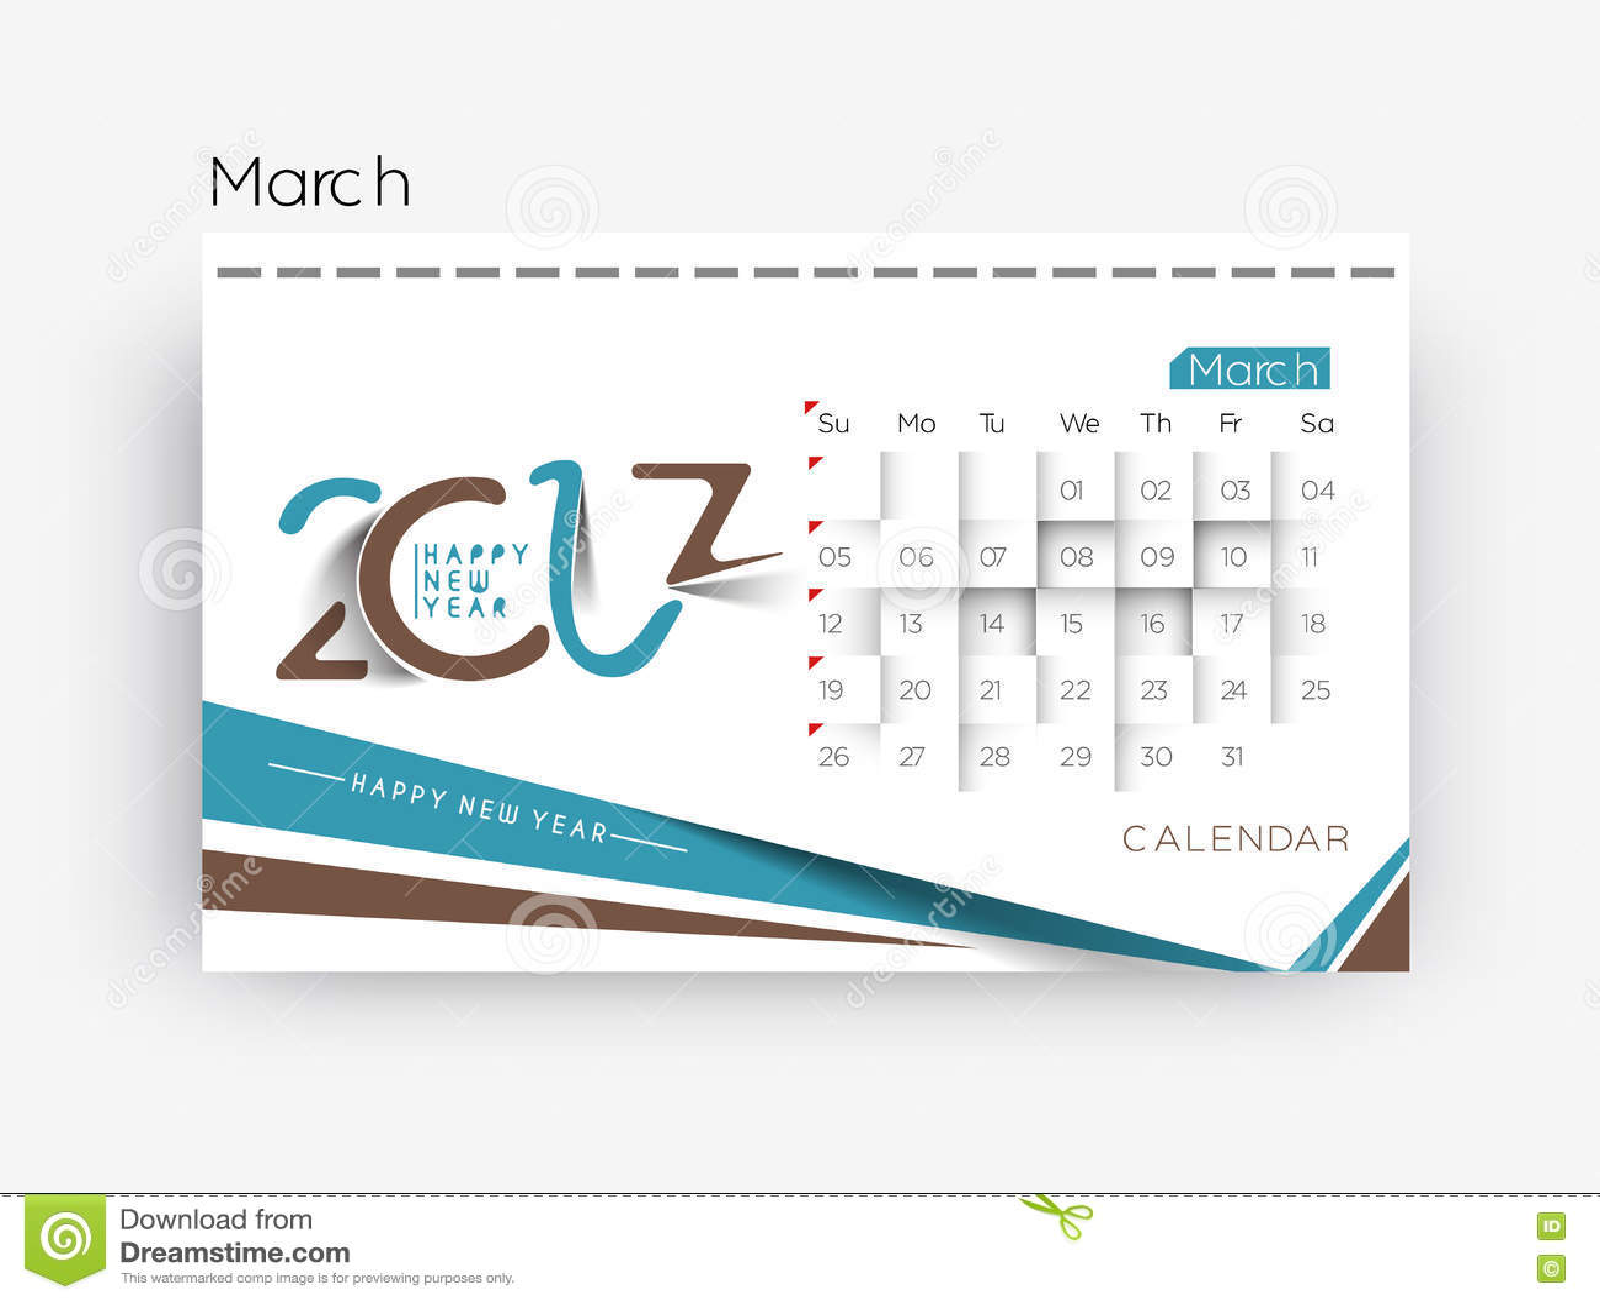 Holiday Calendar Design : Happy new year calendar design elements stock vector